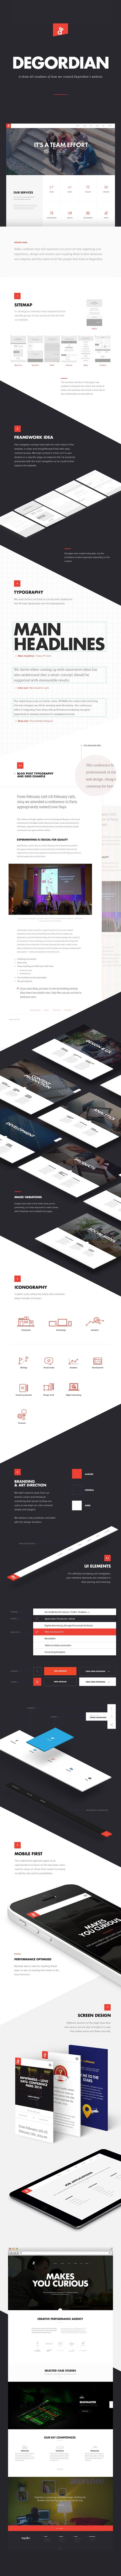 Degordian Agency Website